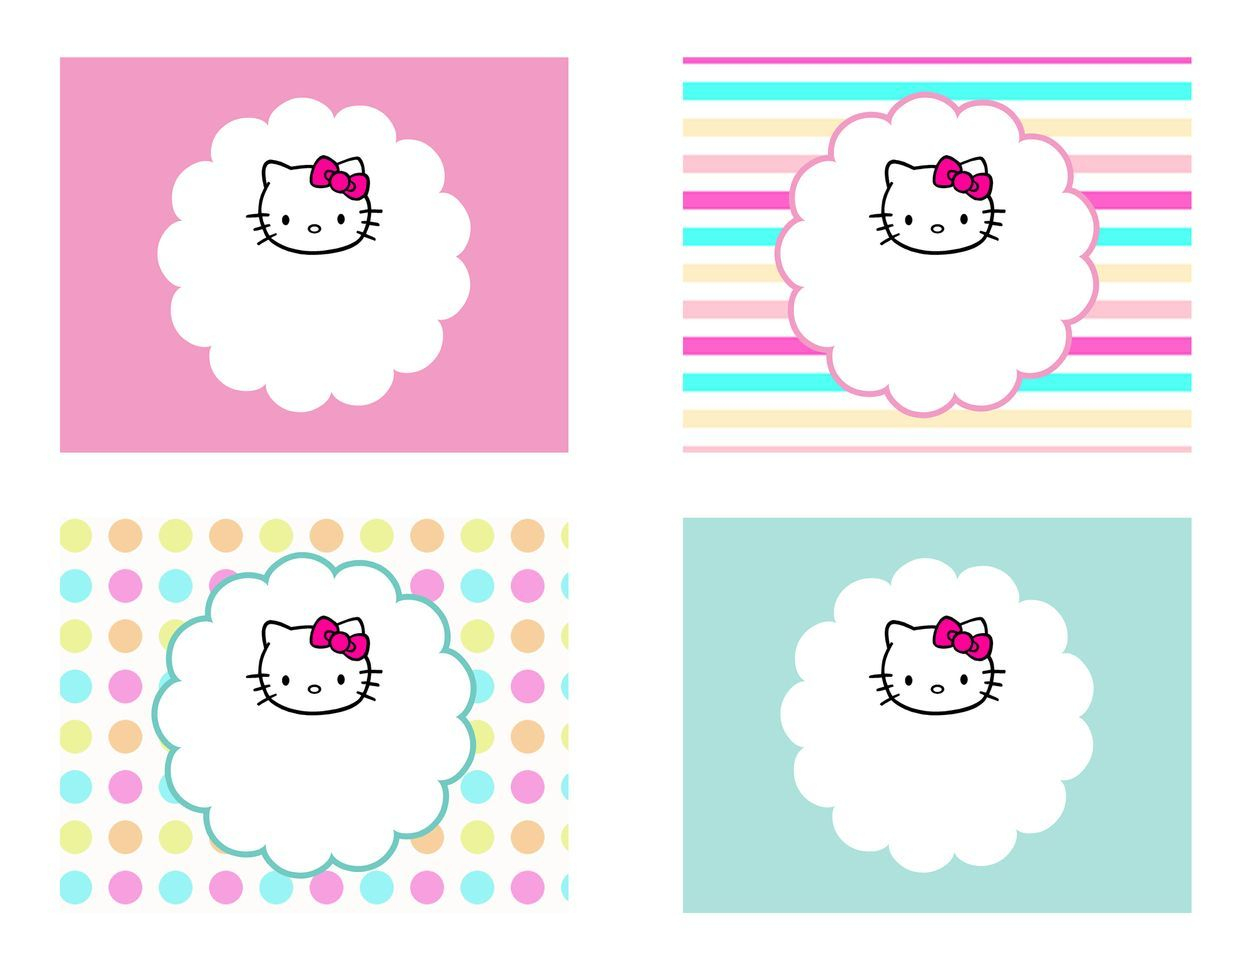 Diy Free Hello Kitty Label | Free Birthday Party Decorations - Hello Kitty Name Tags Printable Free